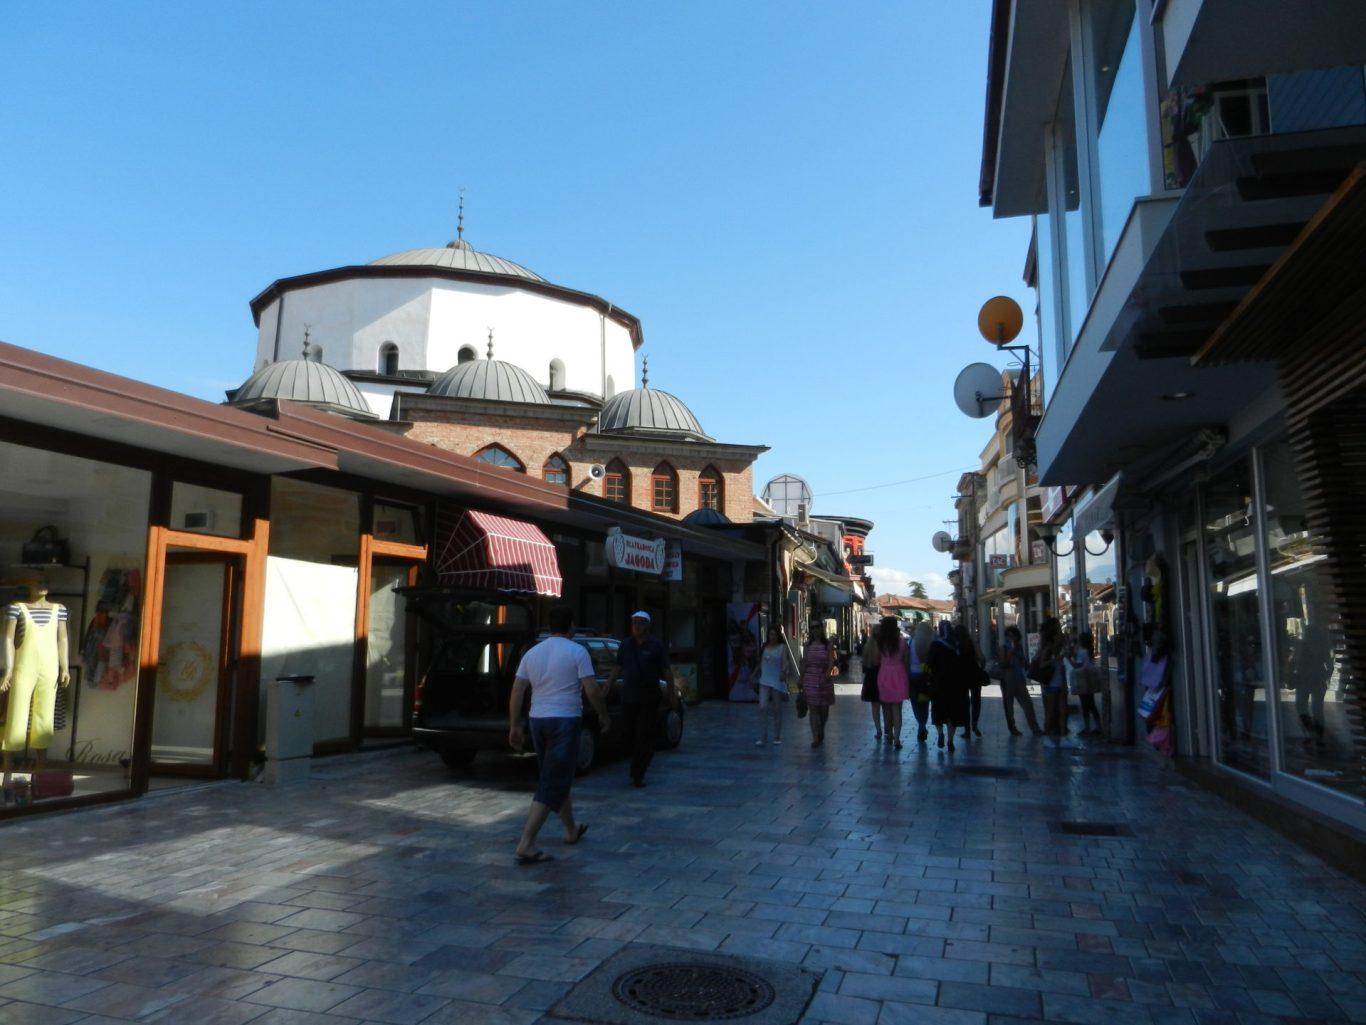 Ali Pasha Mosque in Ohrid, Macedonia